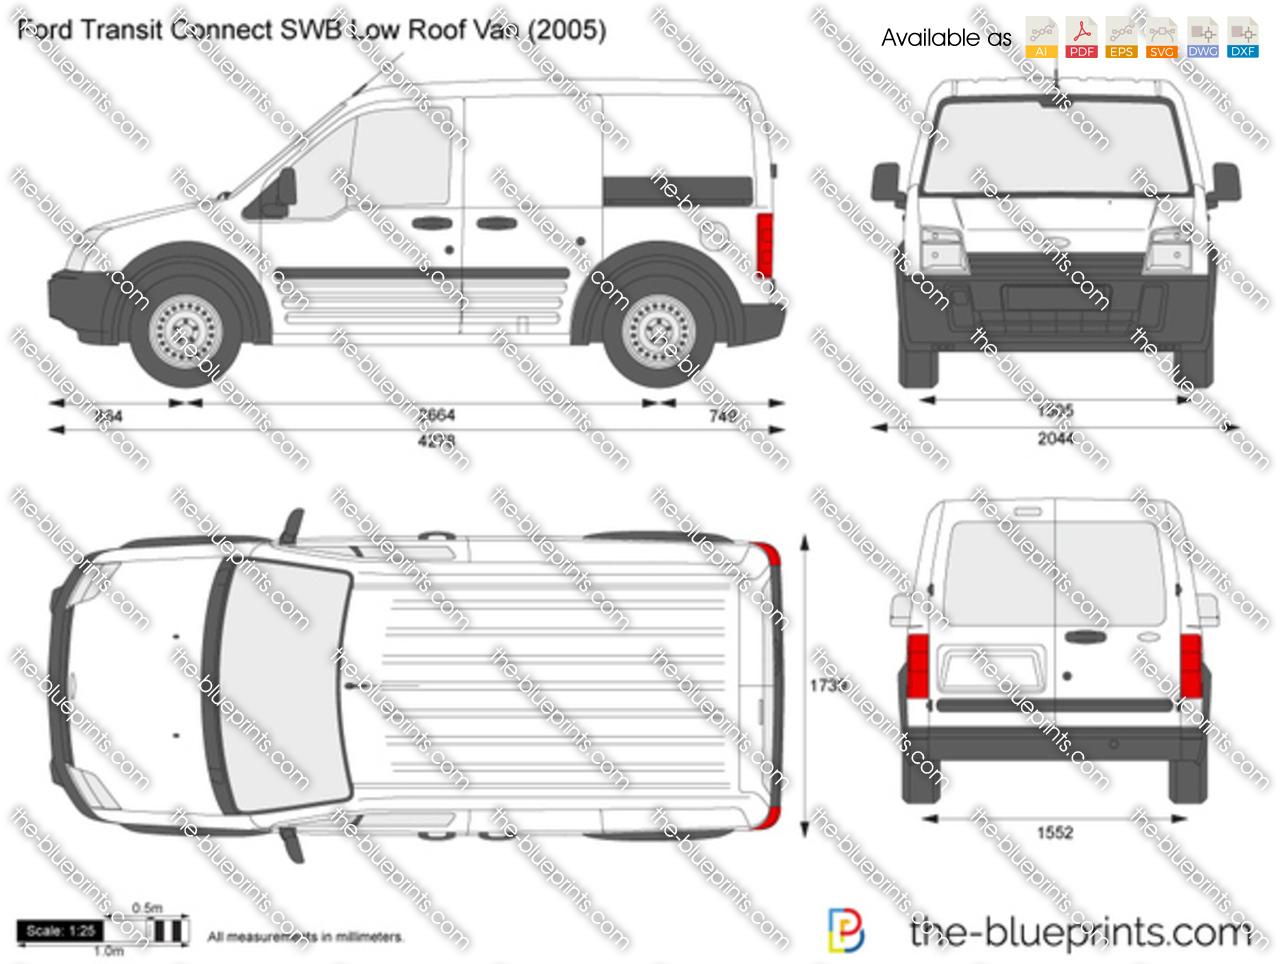 2010 ford transit connect van dimensions. Black Bedroom Furniture Sets. Home Design Ideas